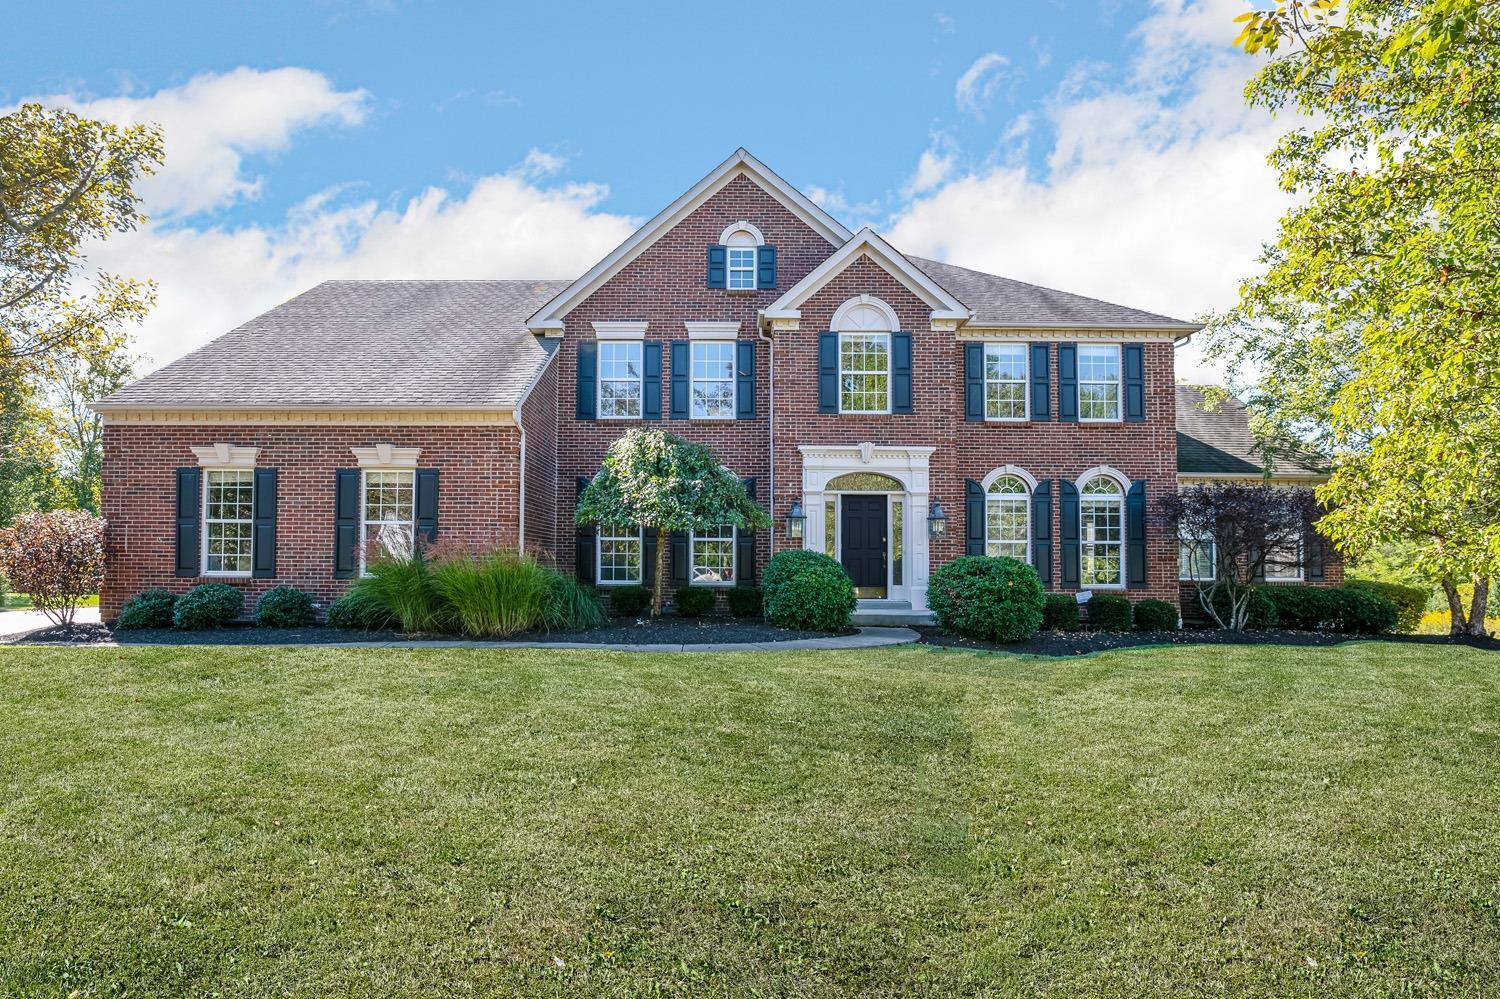 Property for sale at 2643 W Legendary Run, Pierce Twp,  Ohio 45245